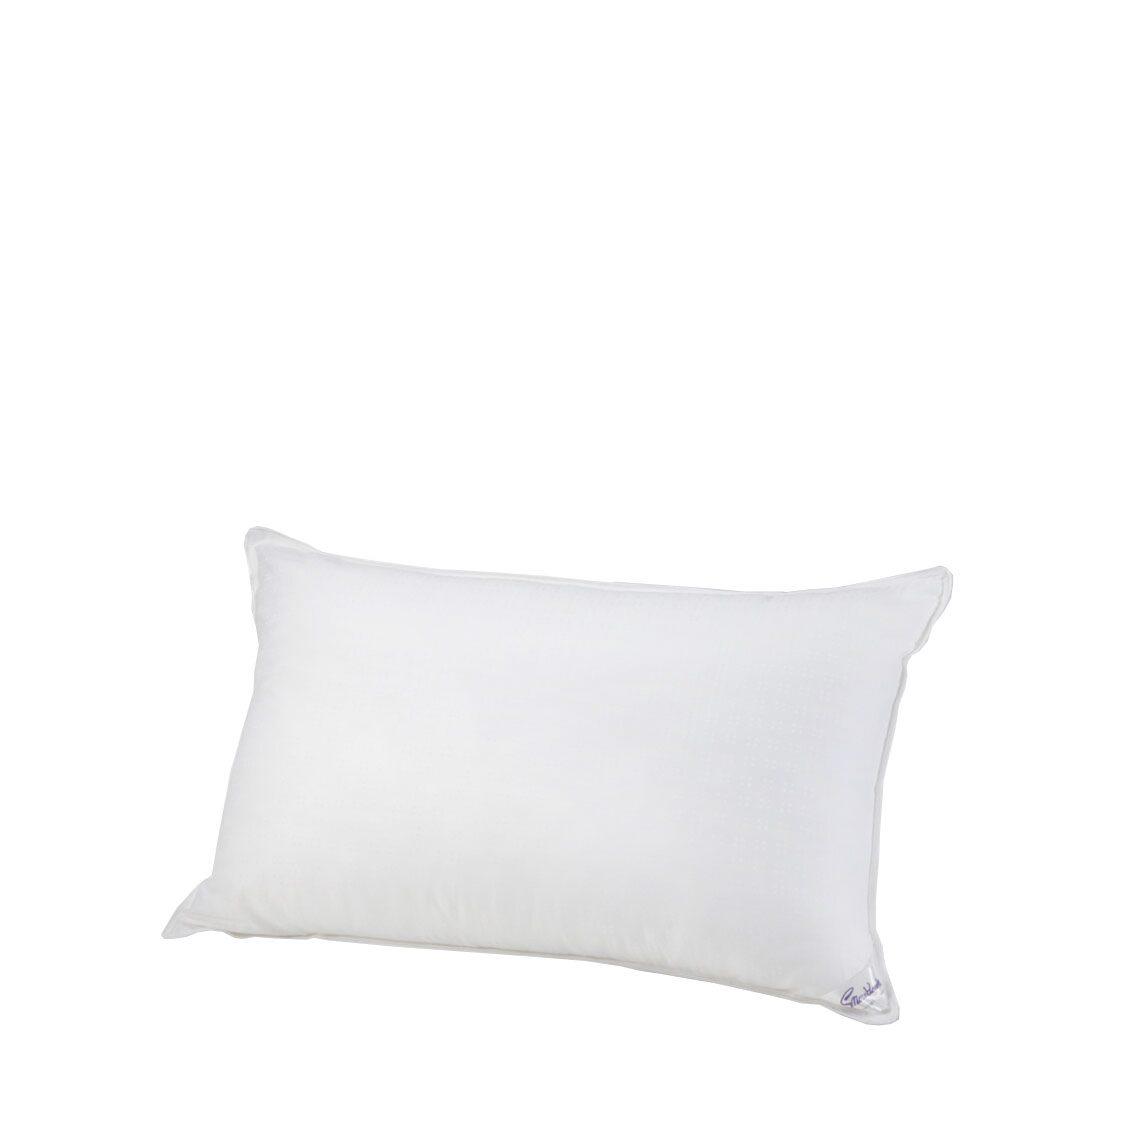 Super Firm Microfibre Pillow